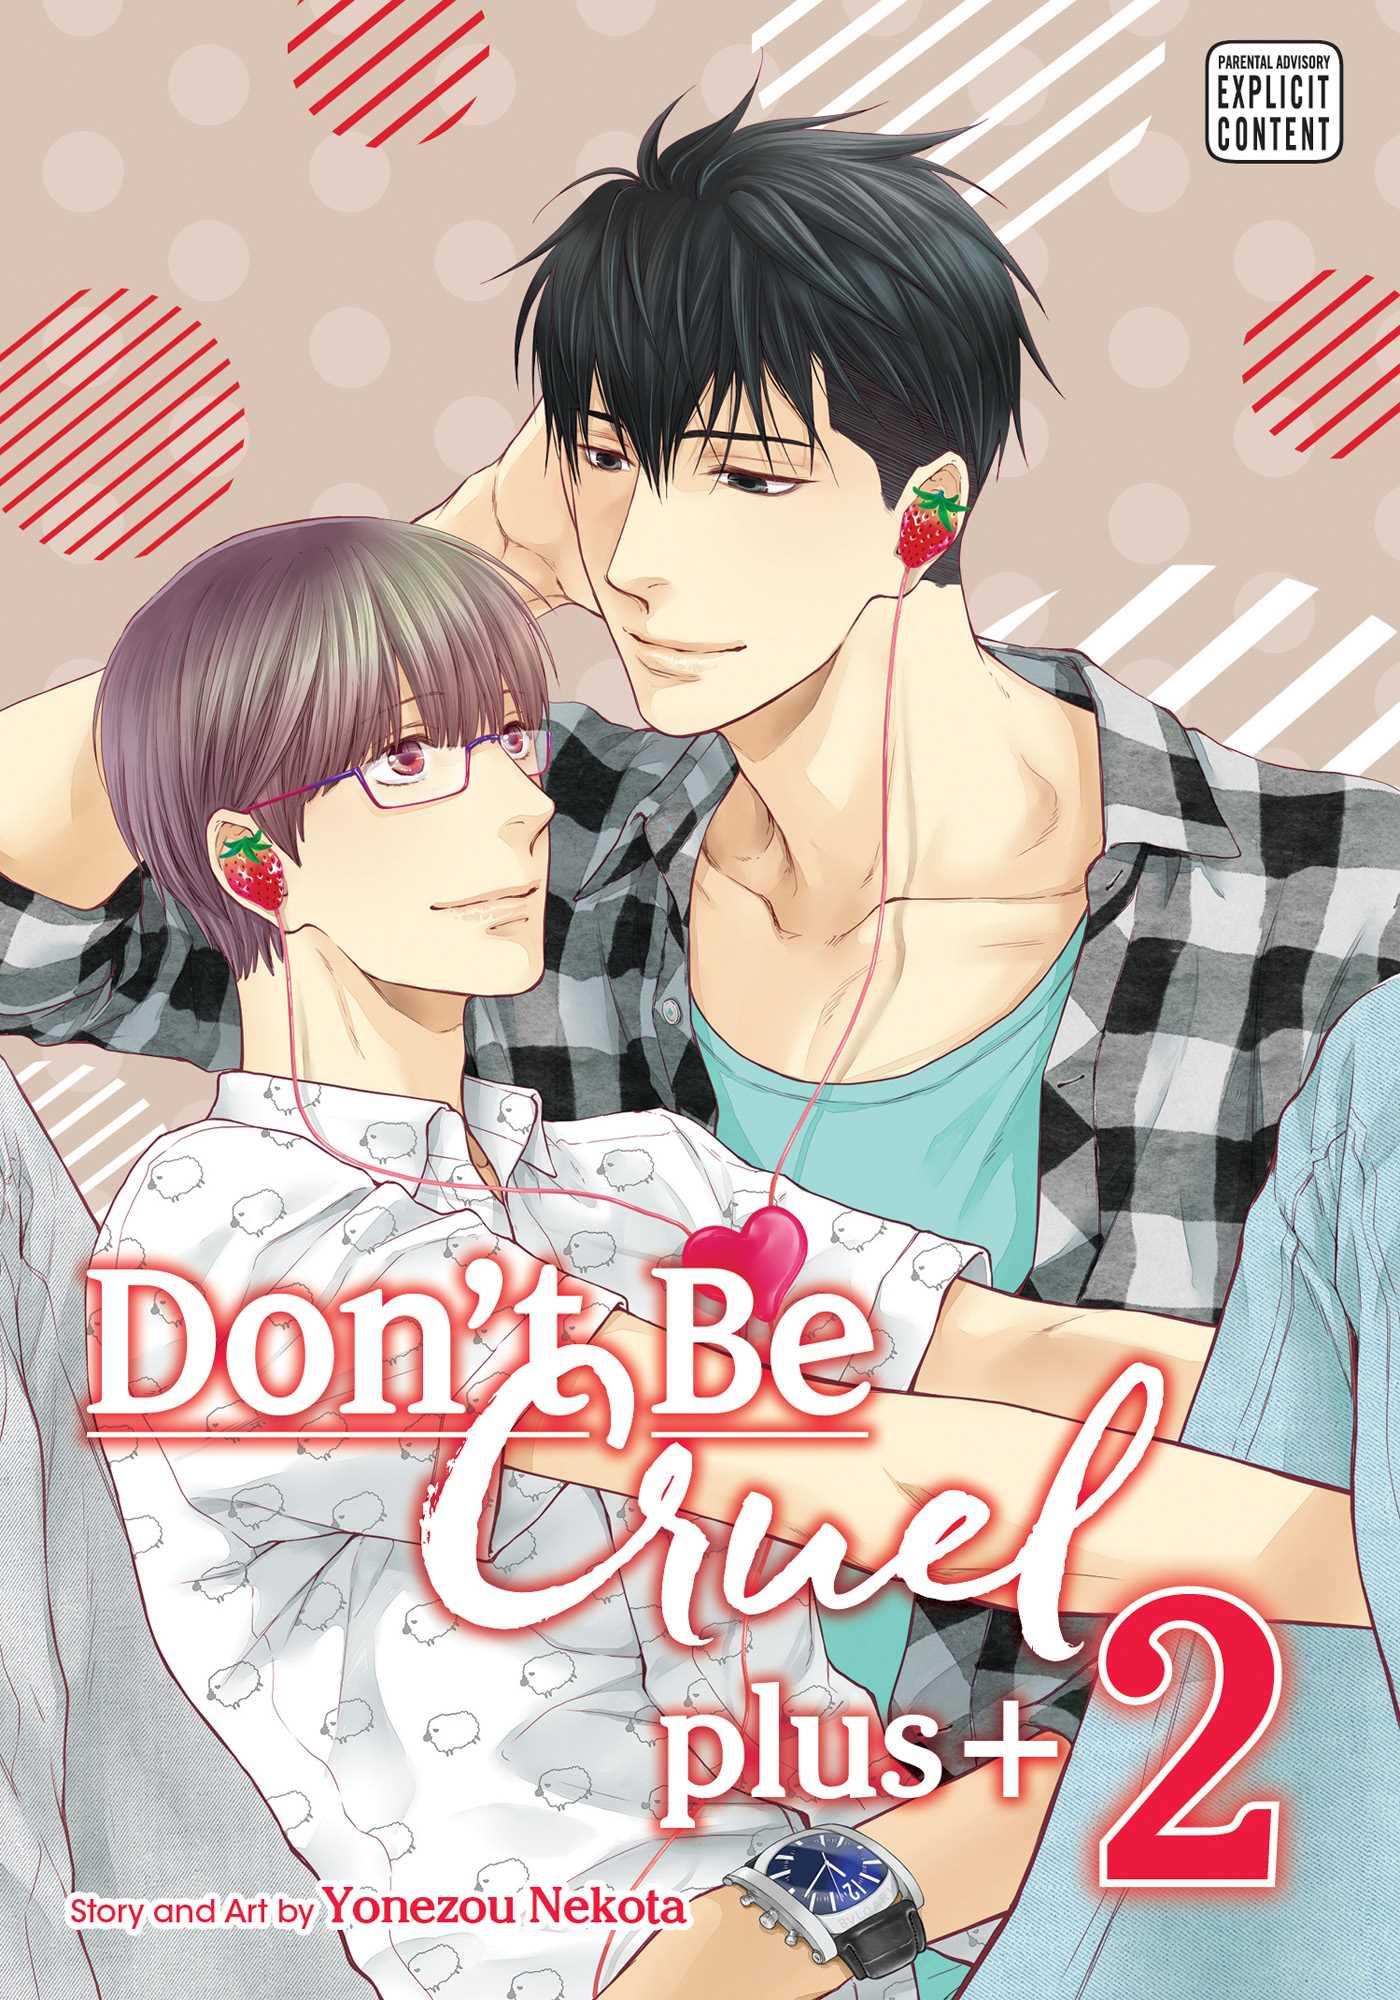 Don't Be Cruel: plus+, Vol. 2